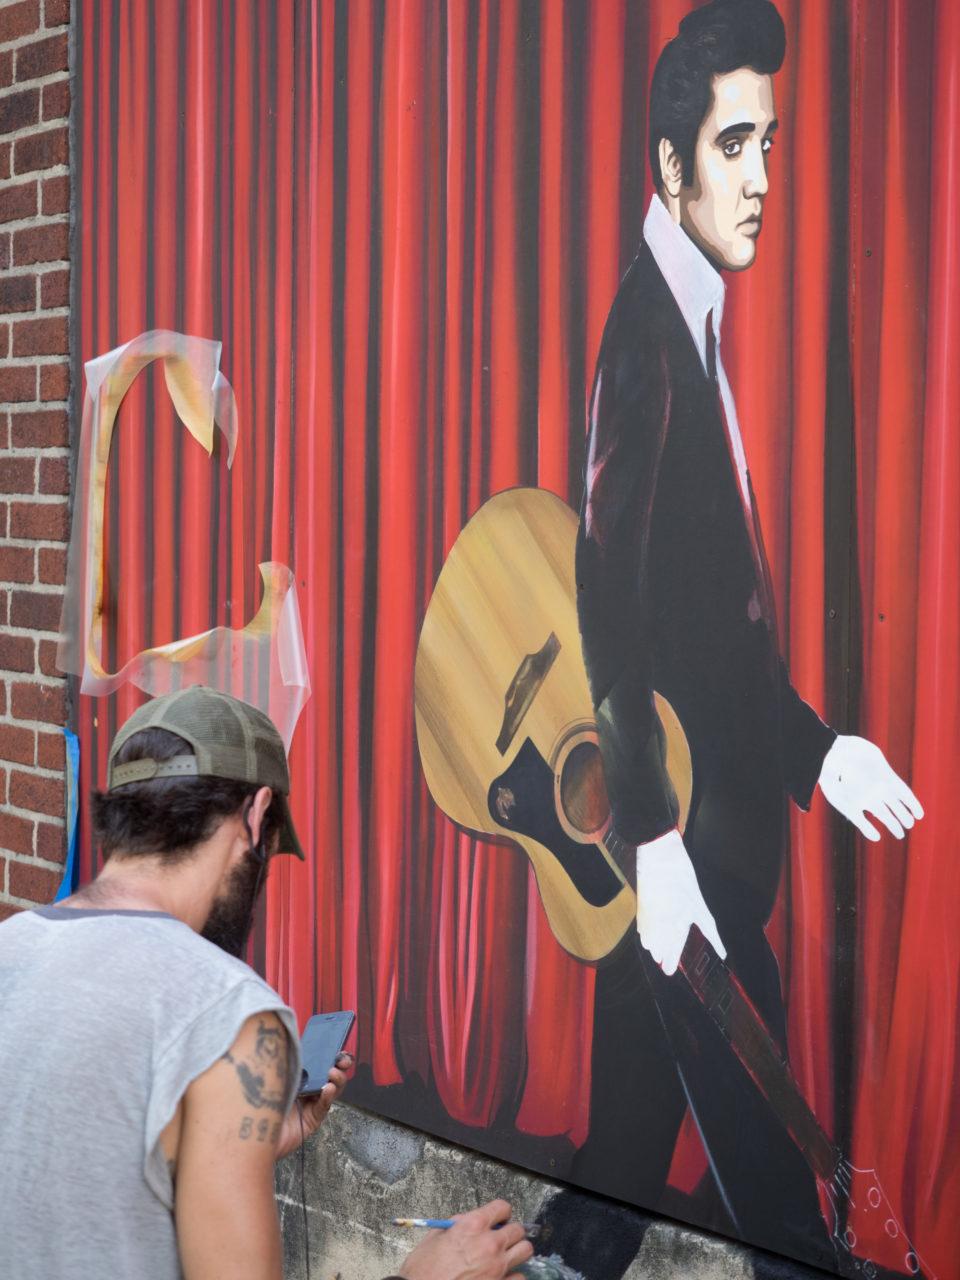 Matt Hooker adds Elvis to the mural created by MooreHooker - 2014